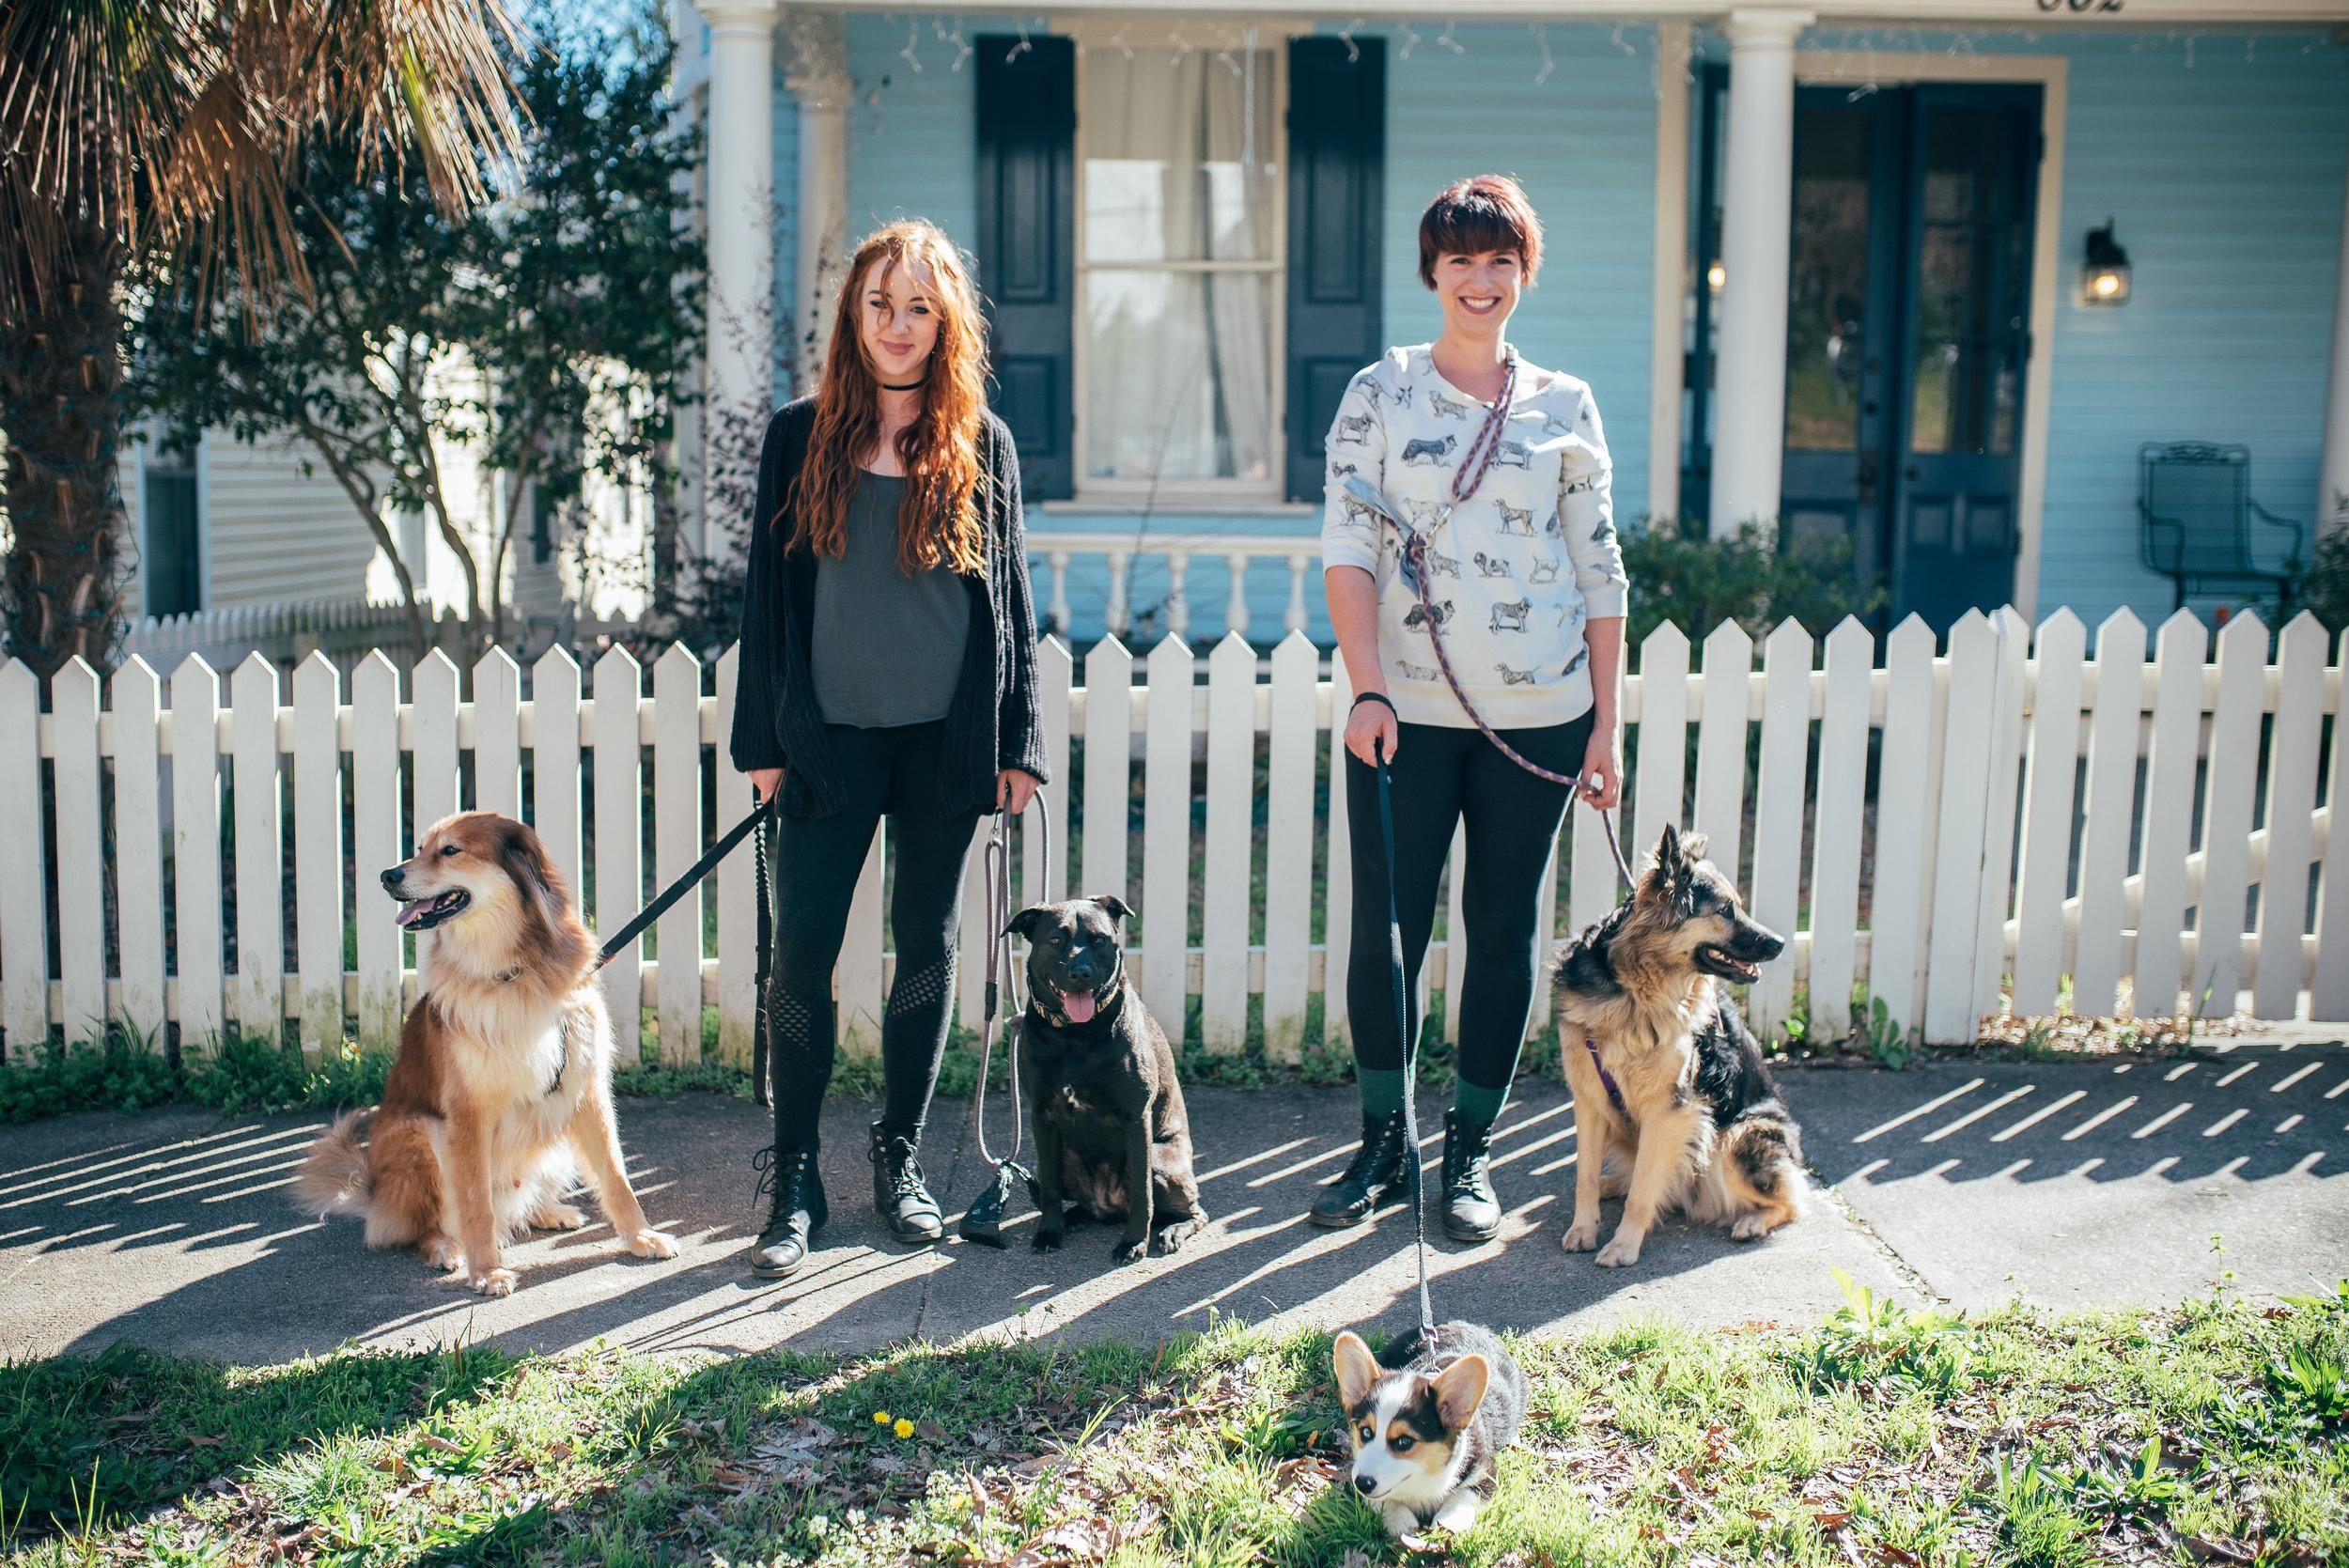 raleigh creative community - raleigh creatives - dogwalking